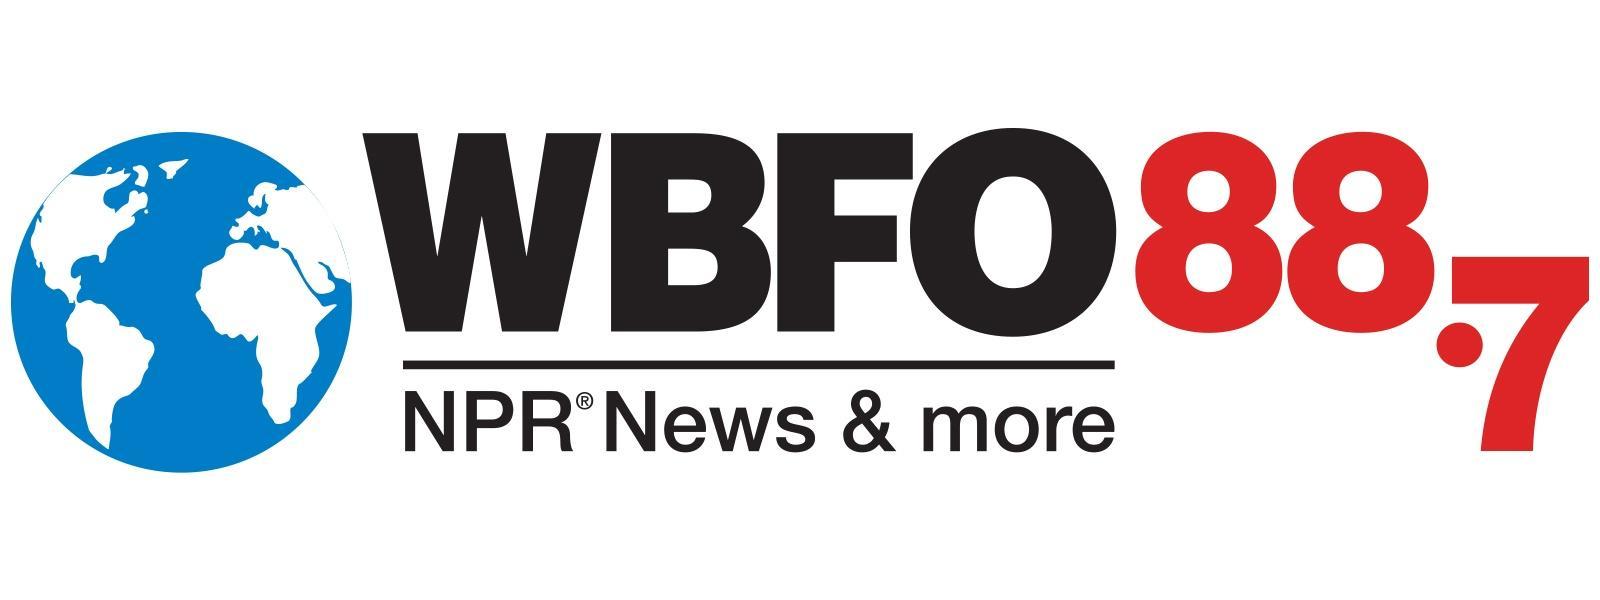 WBFO NPR News & more